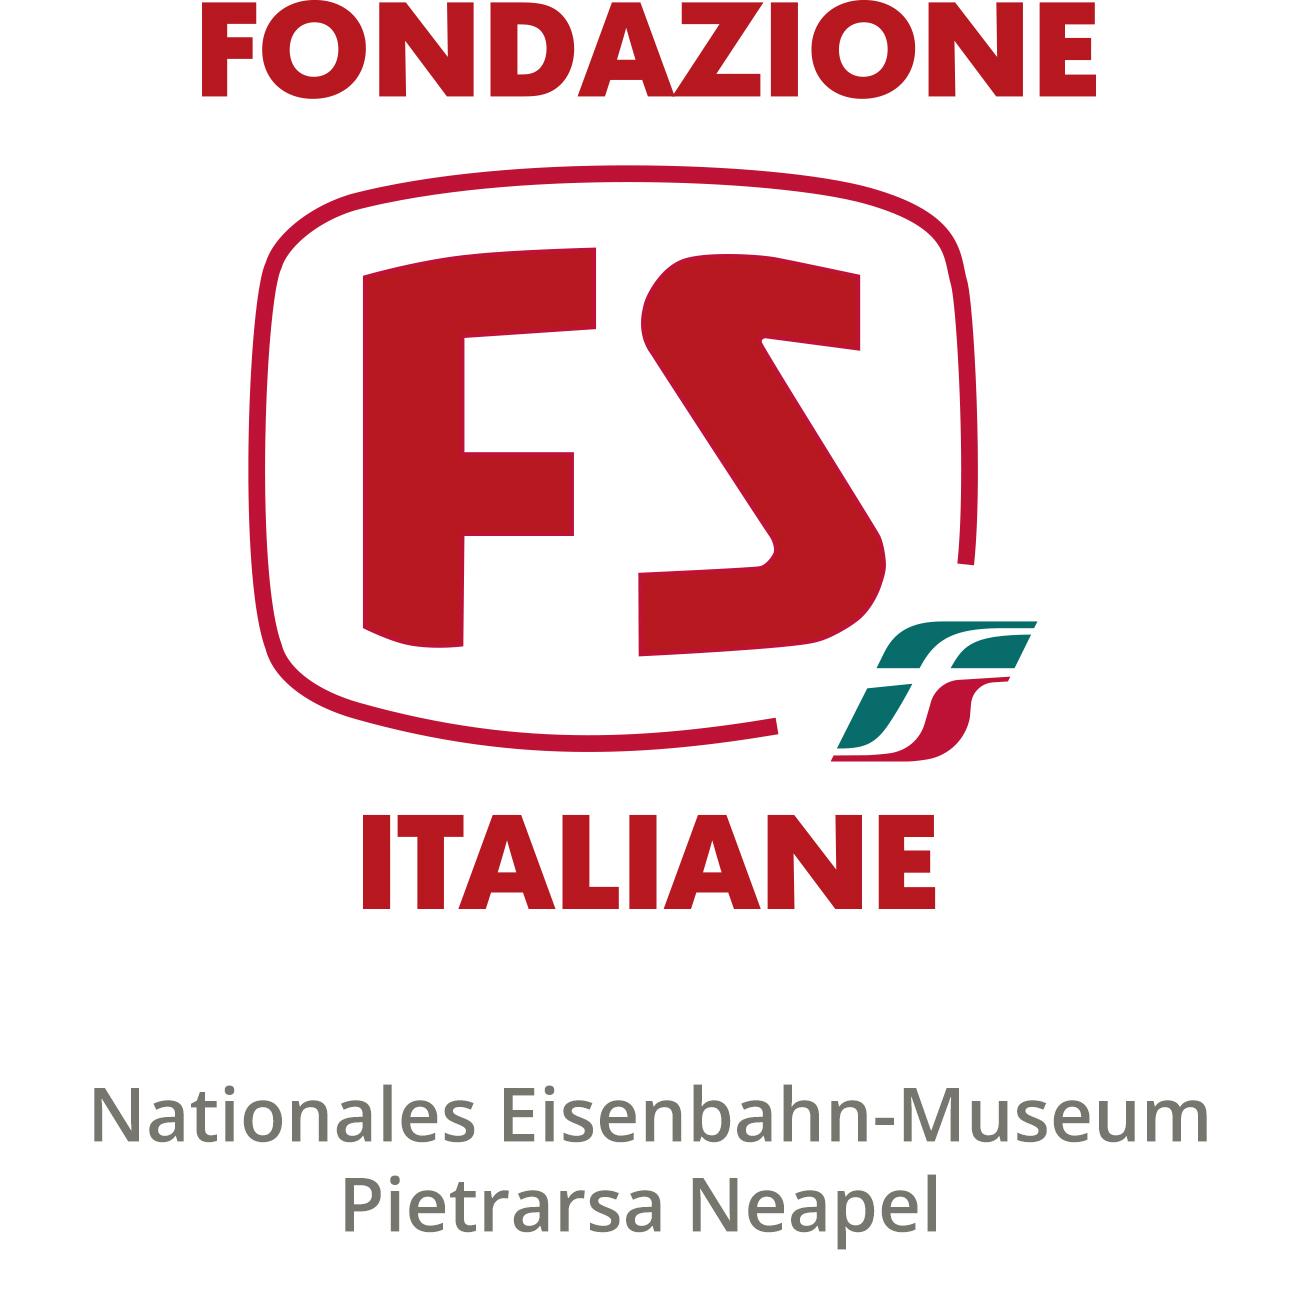 Nationales Eisenbahn-Museum Pietrarsa Neapel